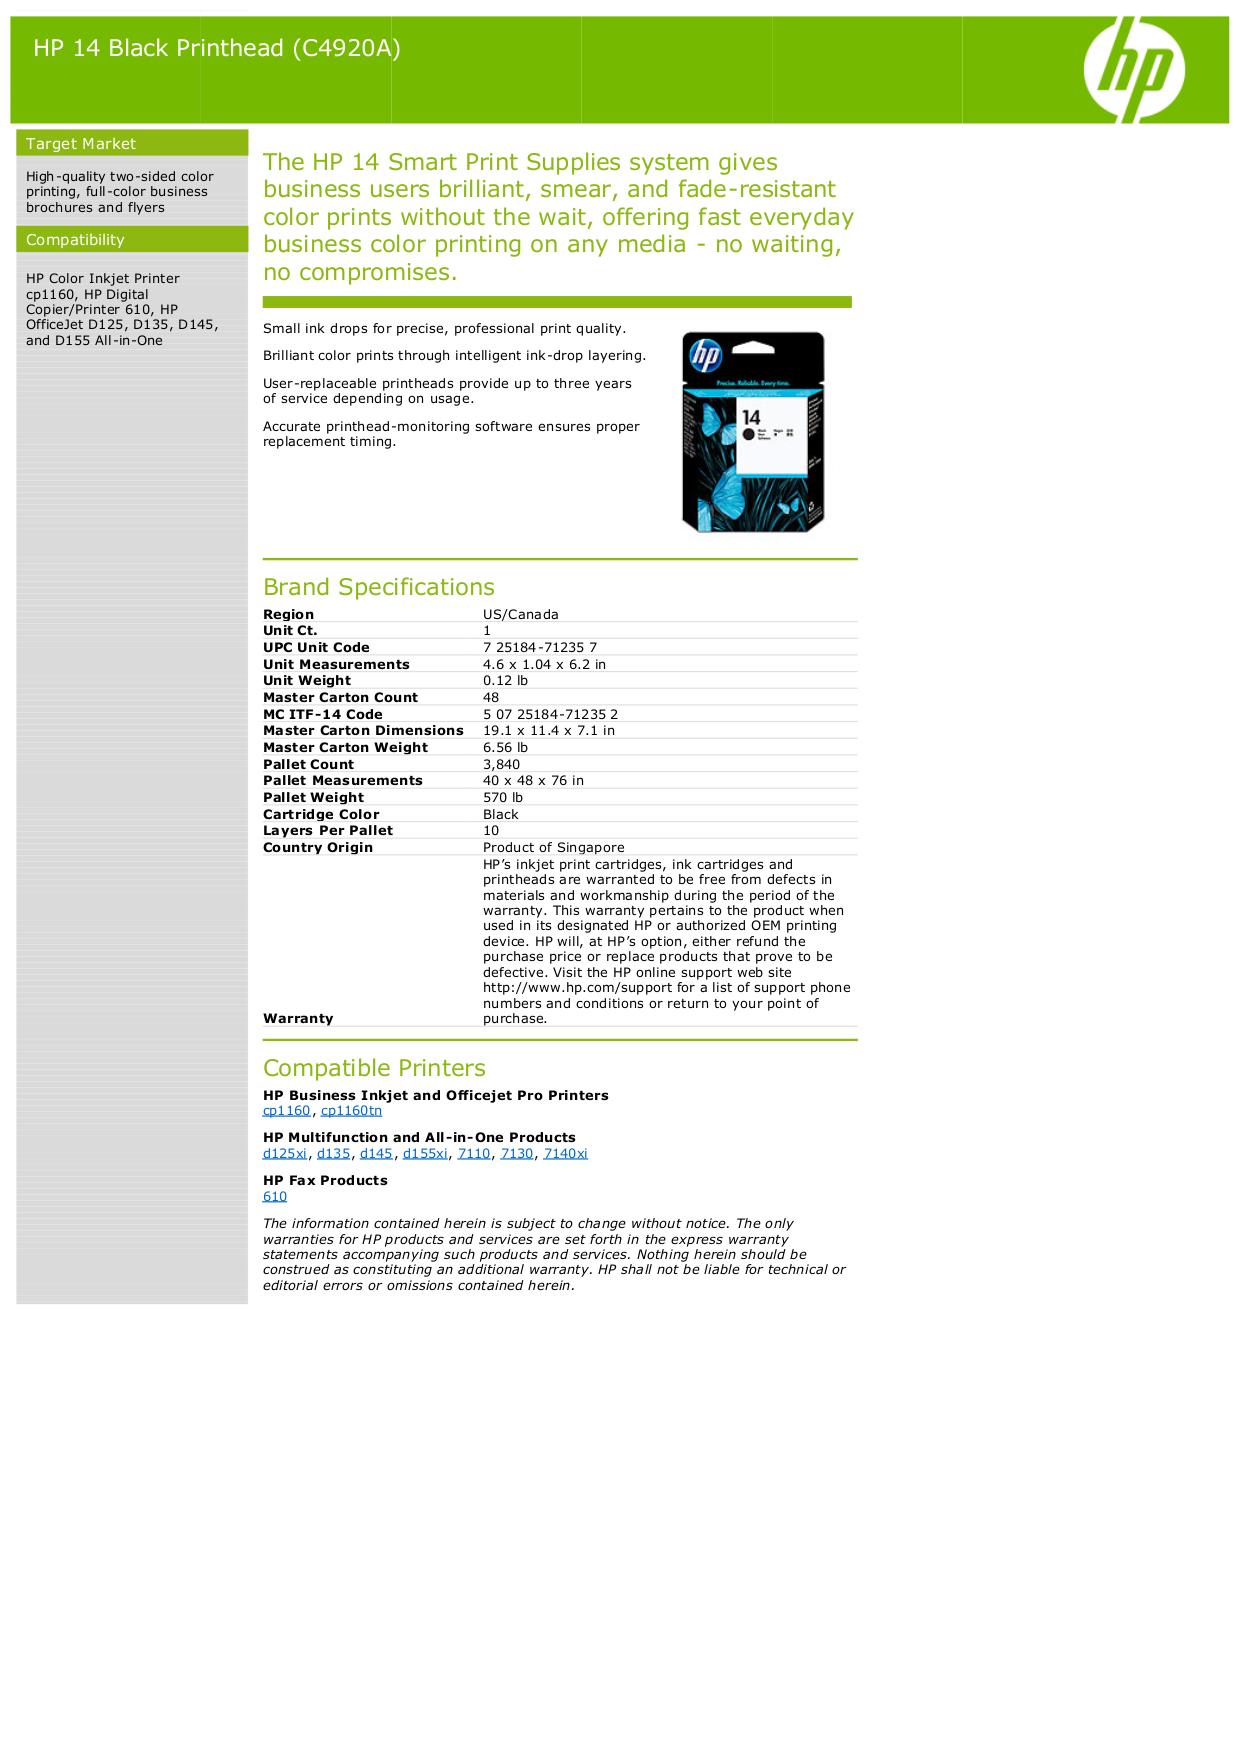 pdf for HP Printer Business Inkjet cp1160tn manual